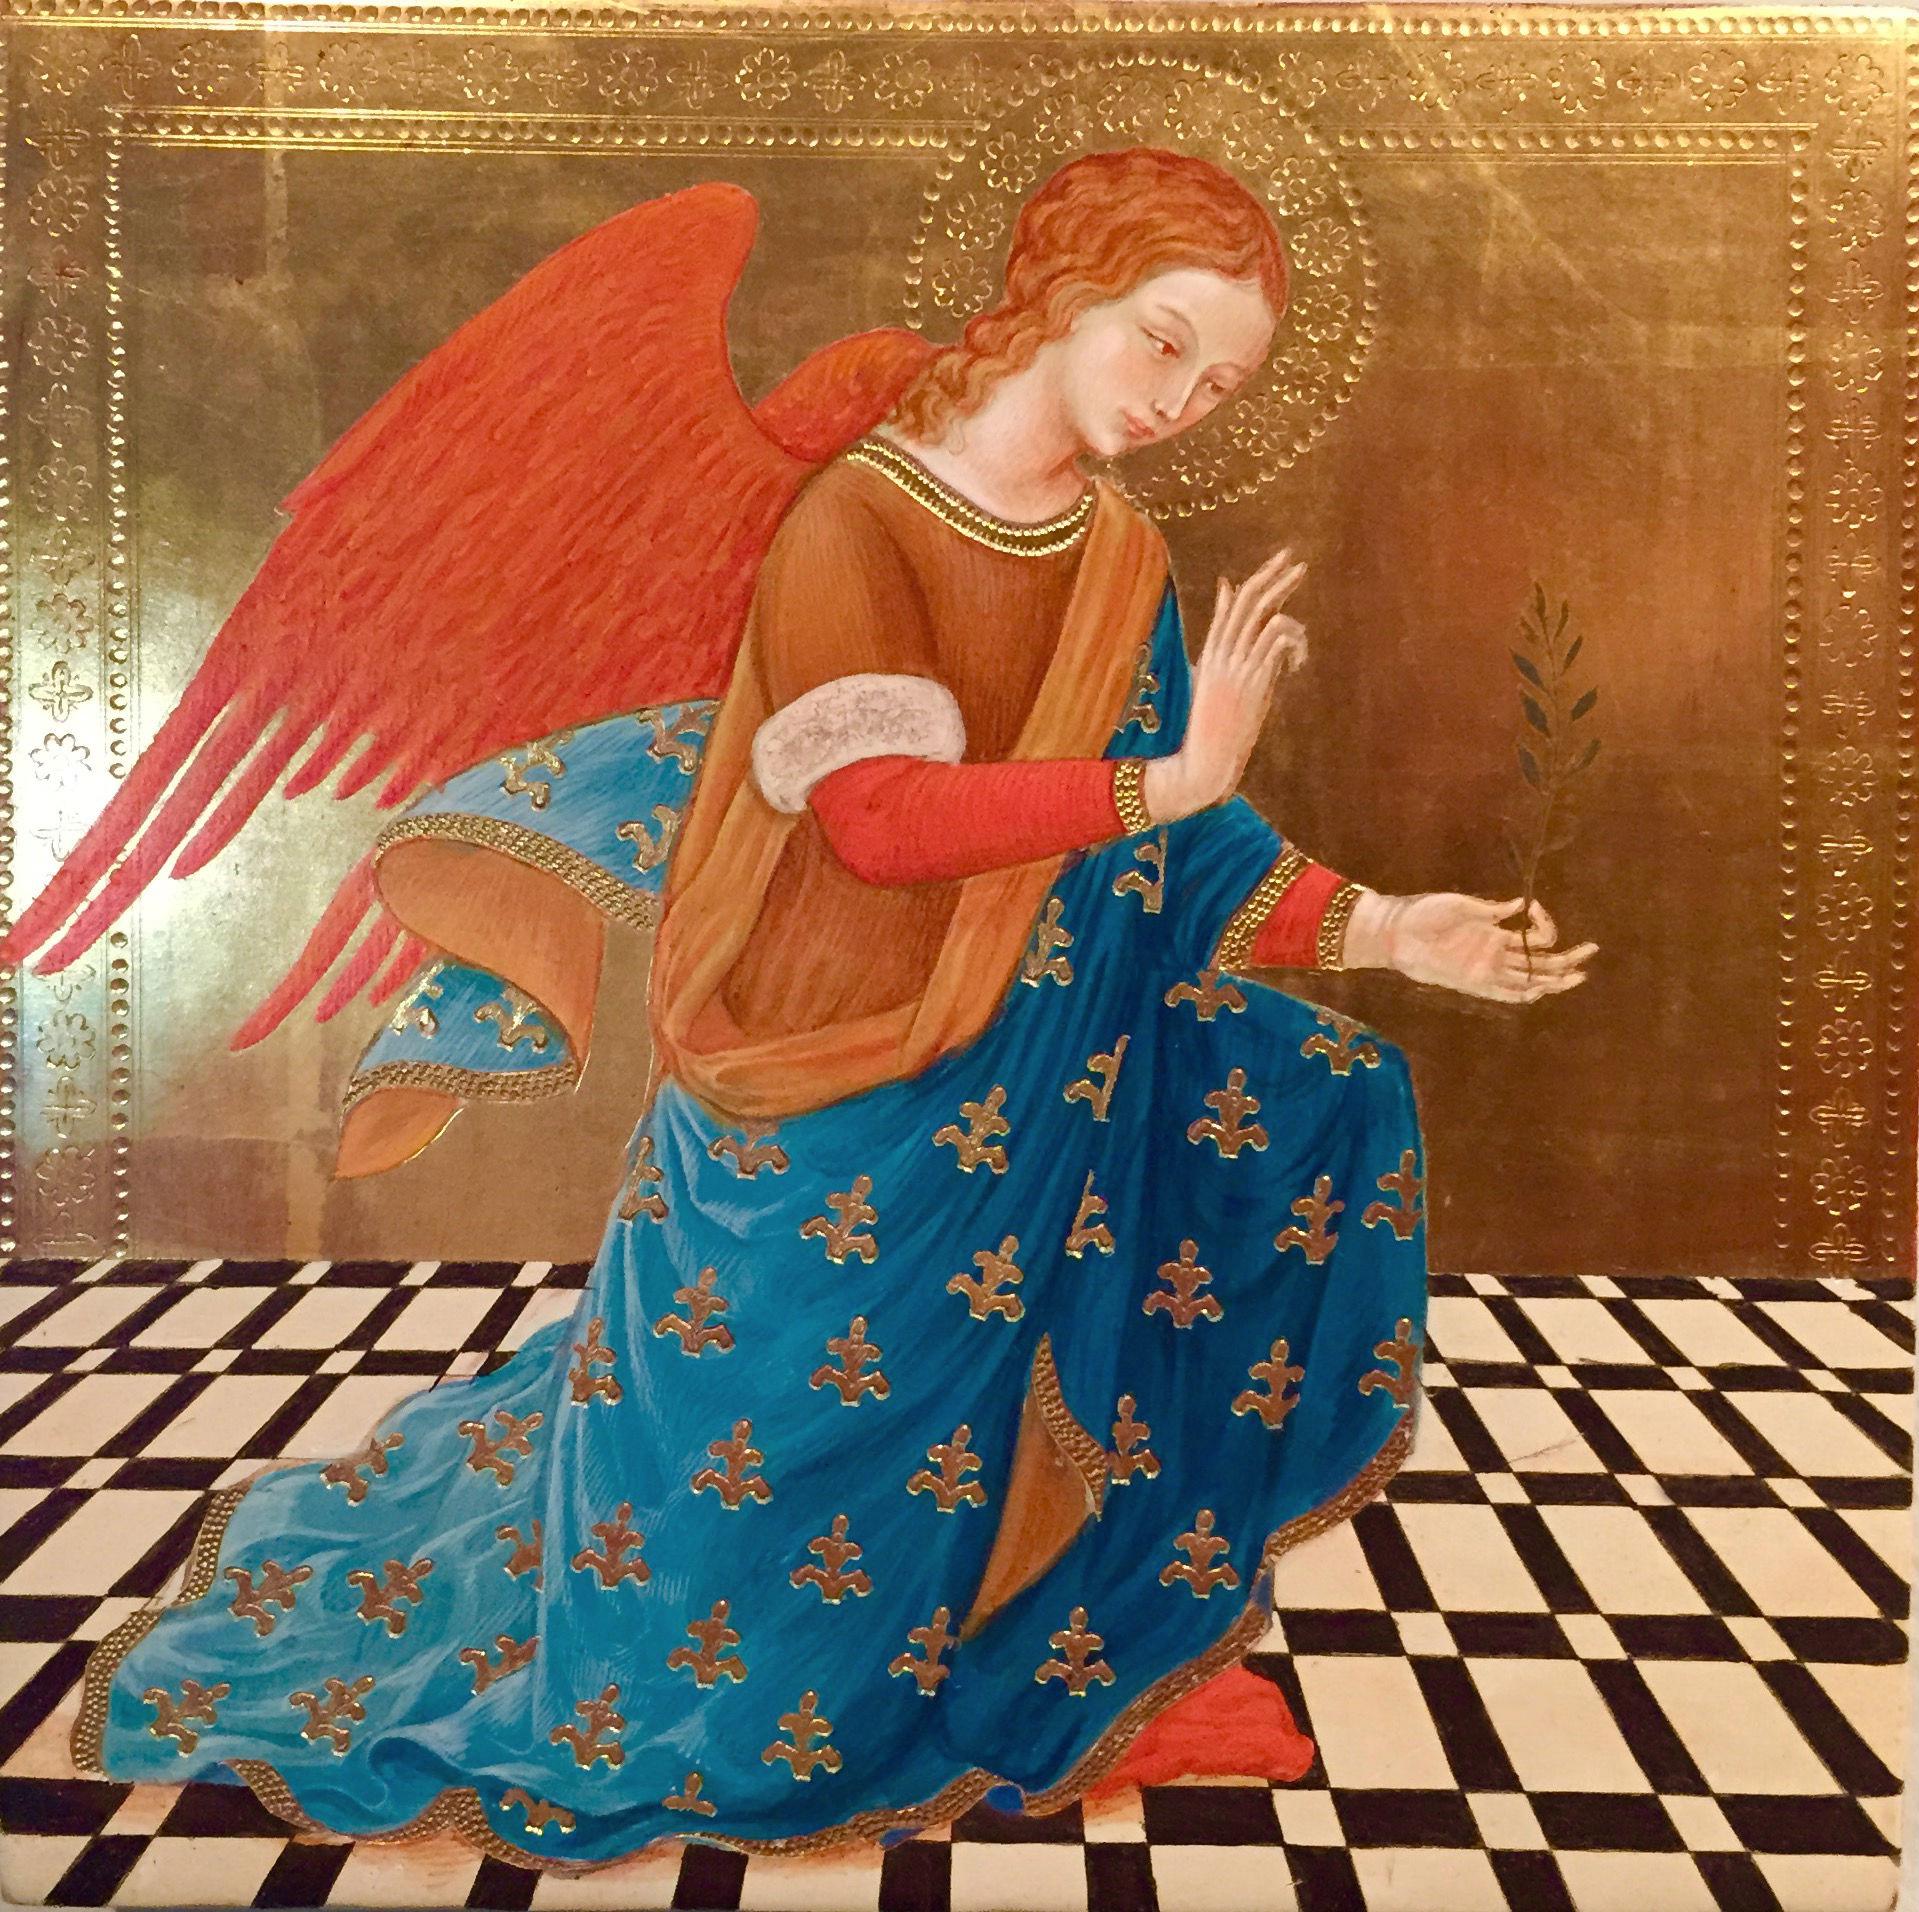 Michelangelo's Angel_02.jpg